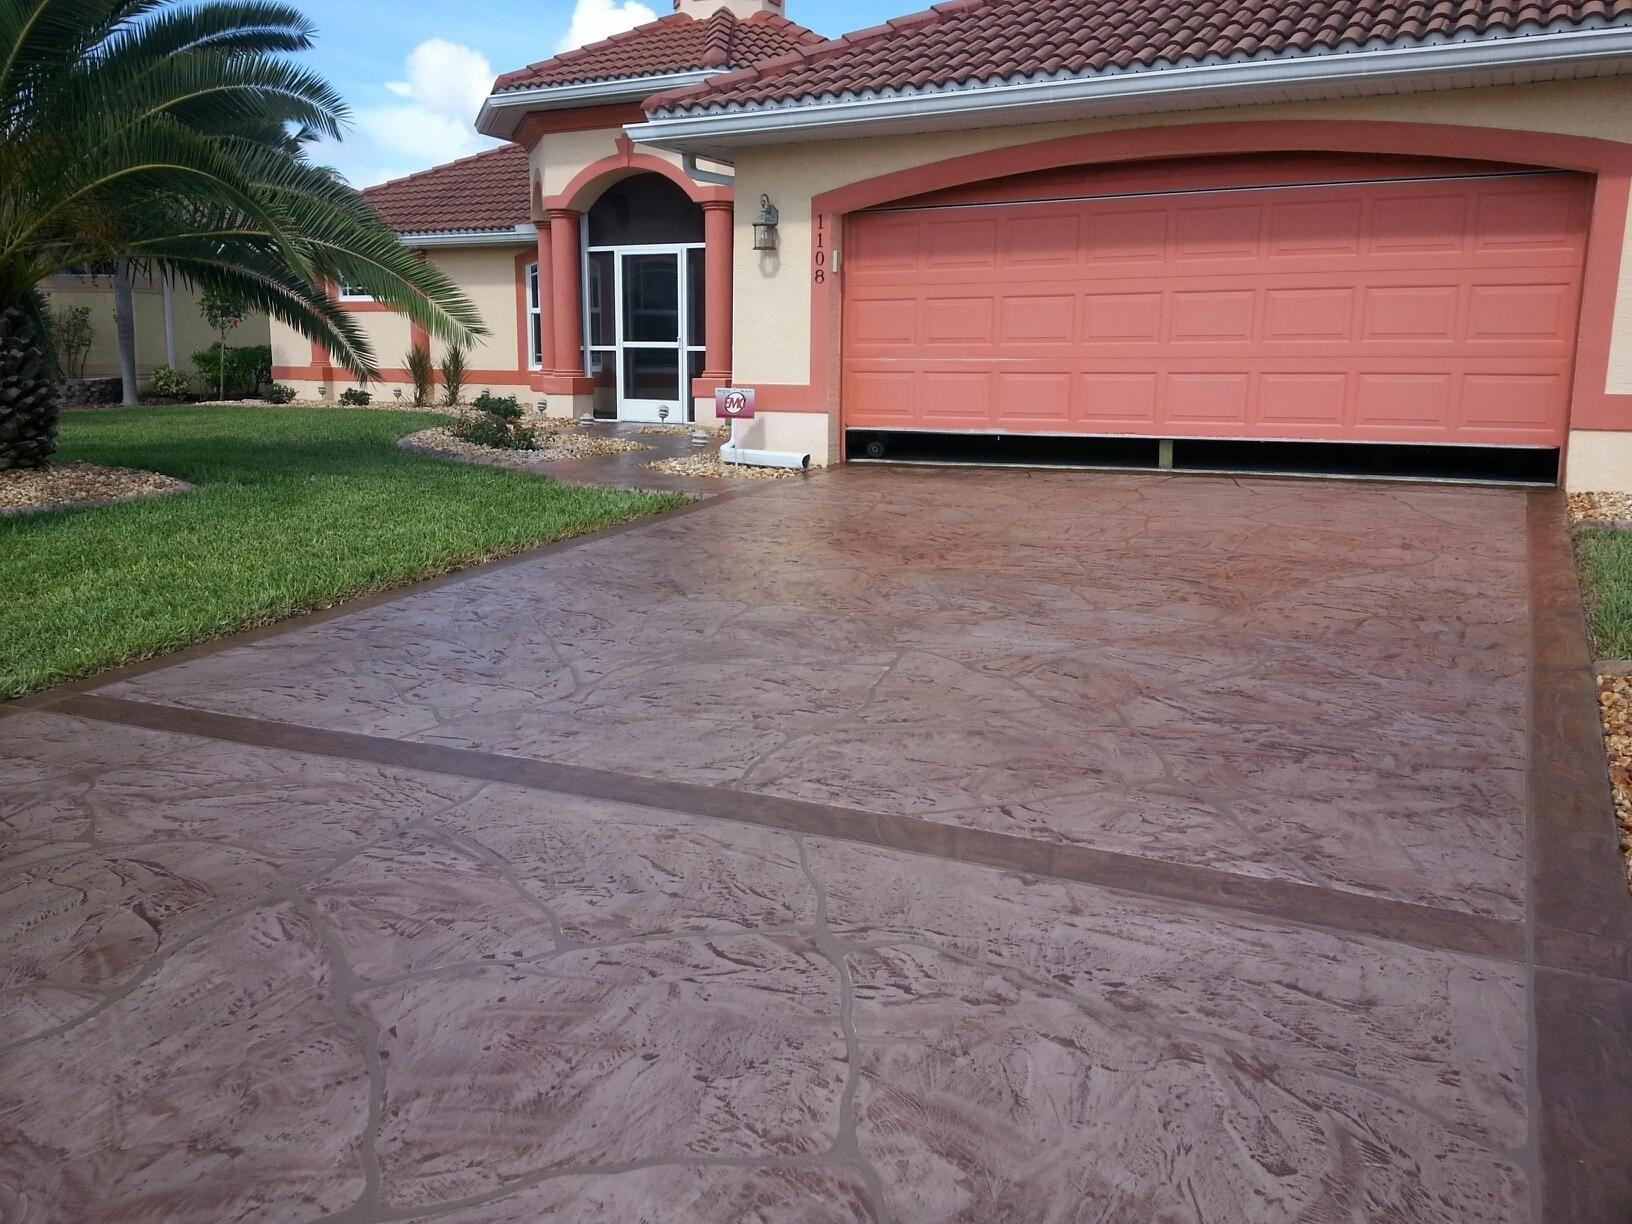 Decorative Concrete Driveway In Cape Coral The Base Color Was